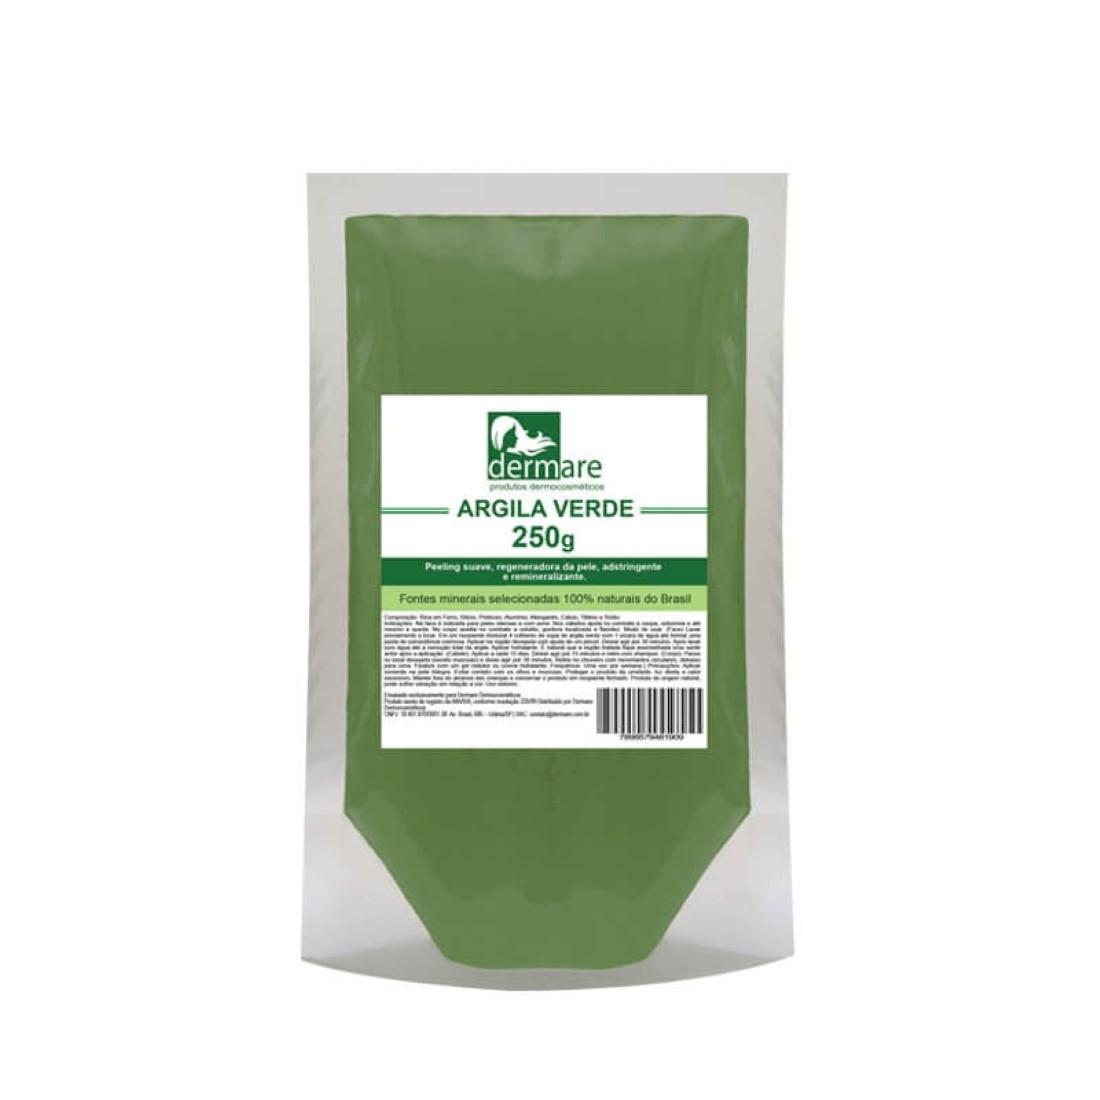 Argila Verde 250g - Dermare